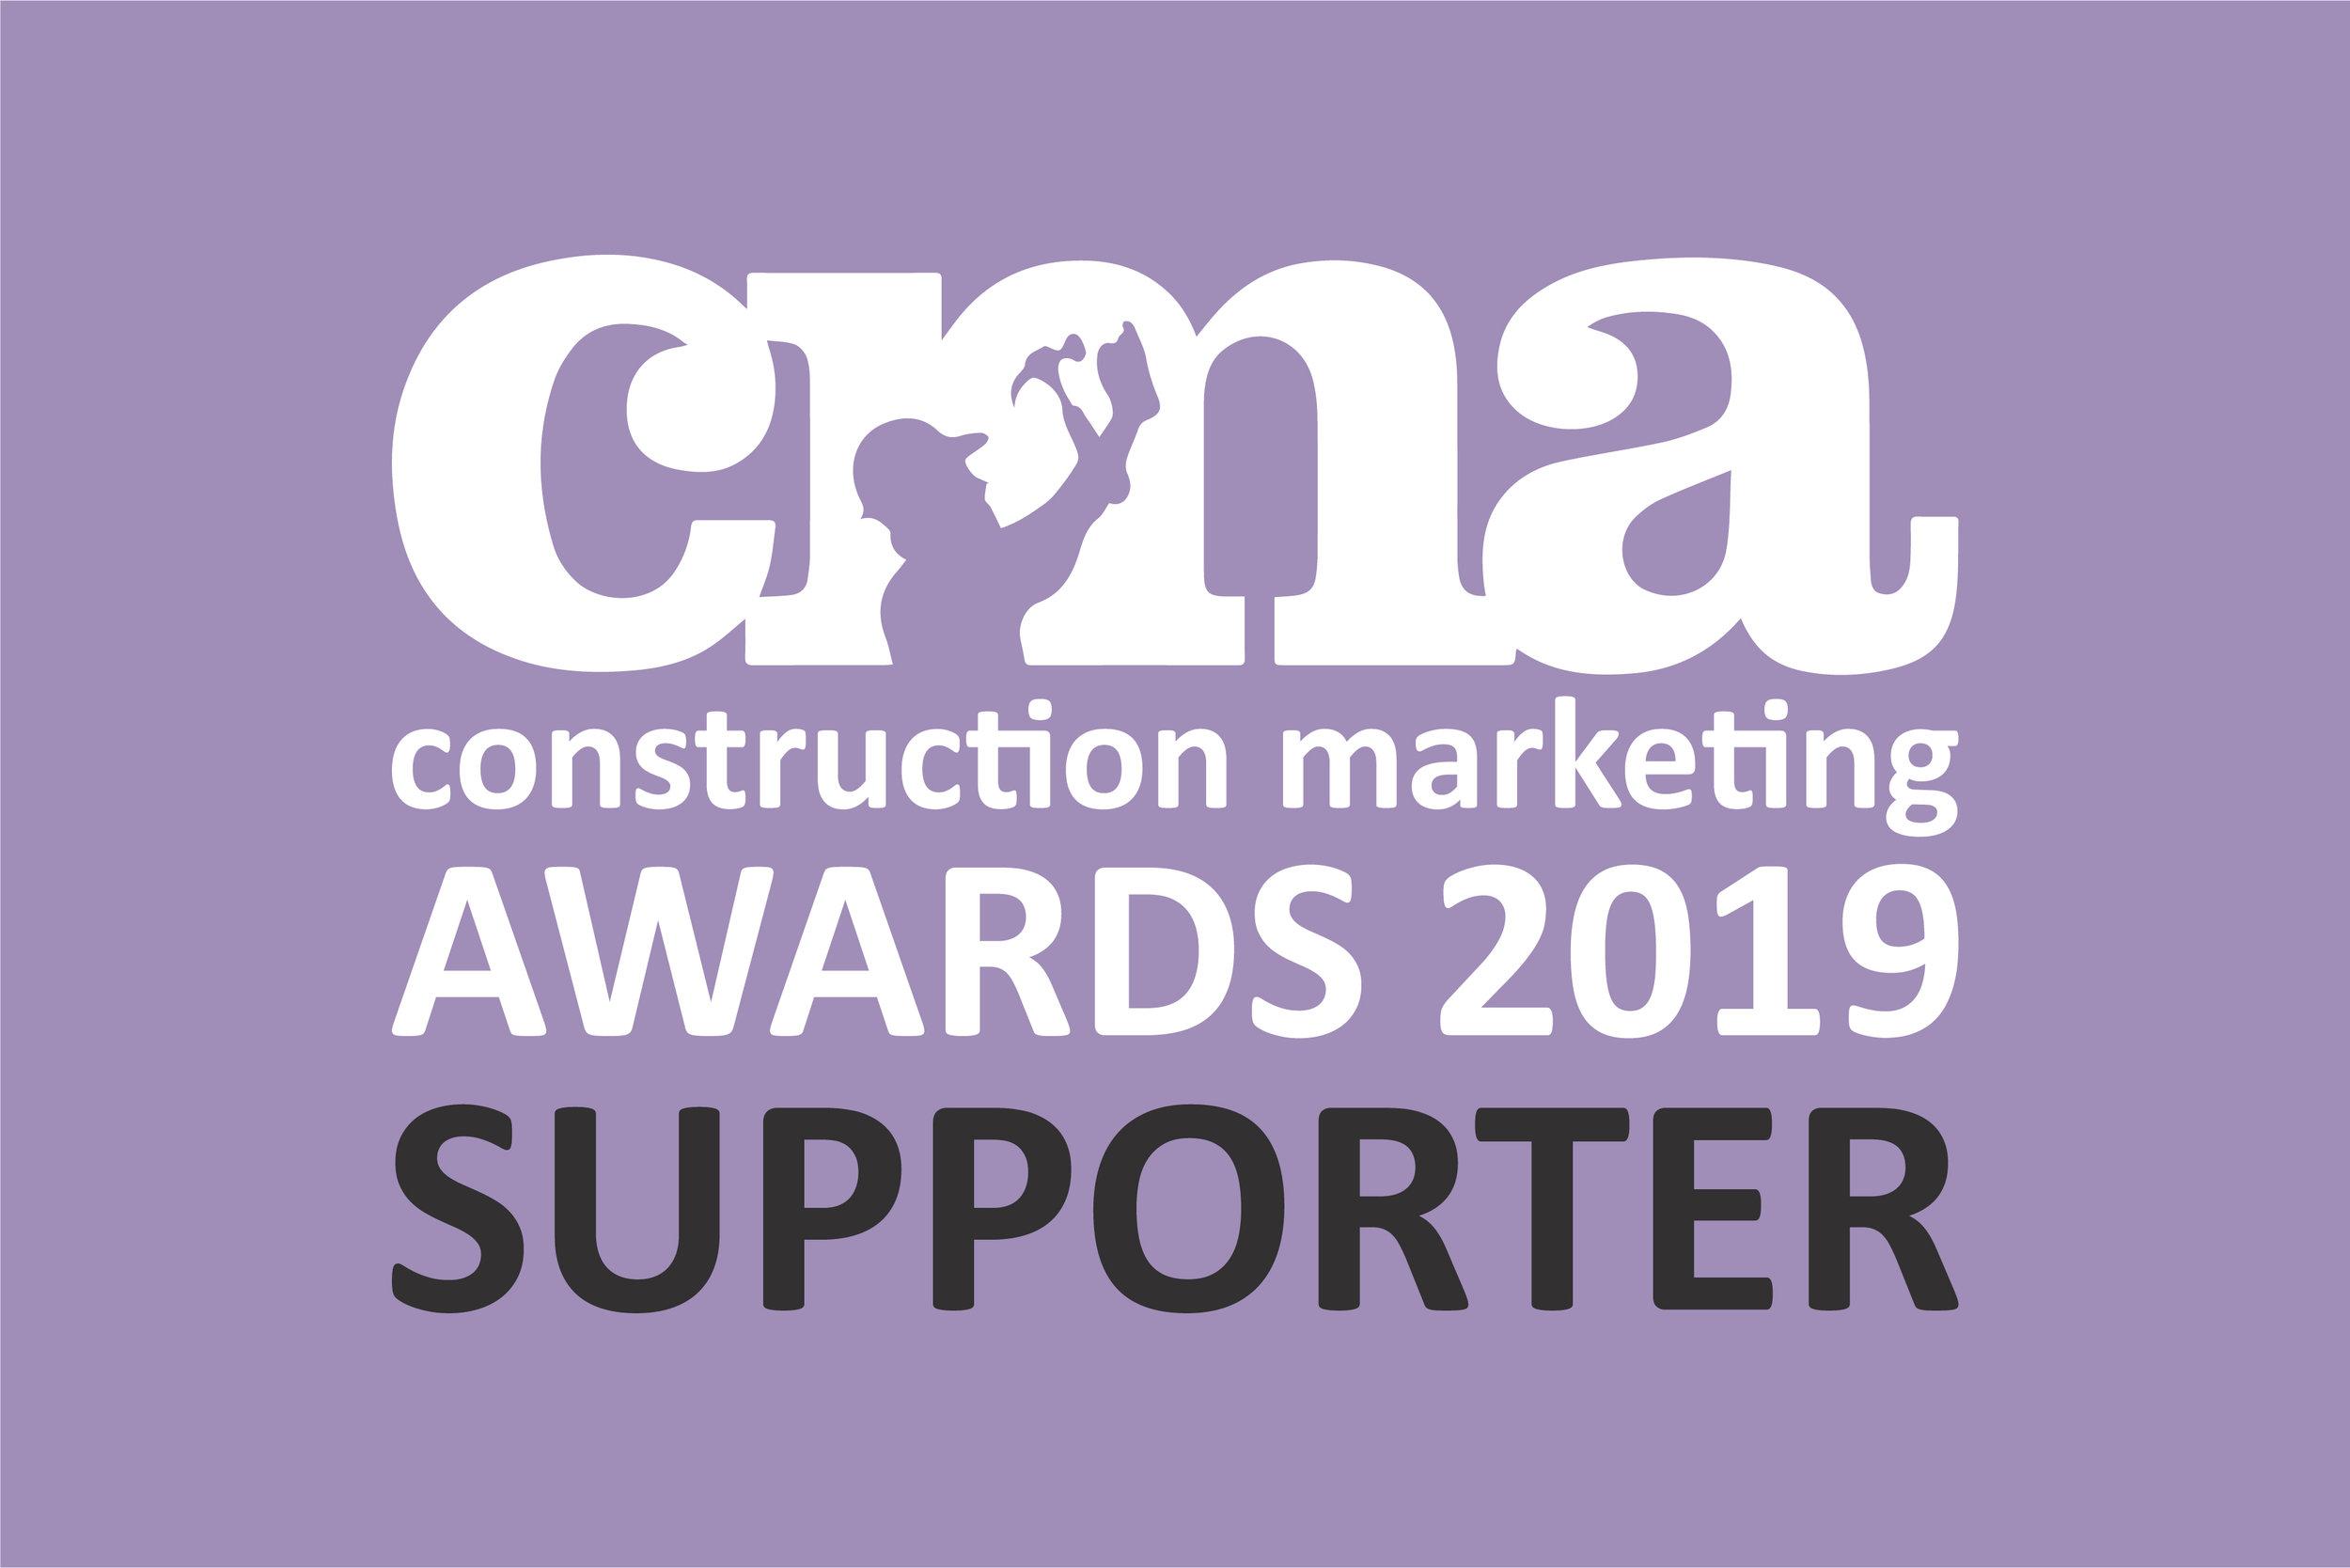 Construction Marketing Awards 2019